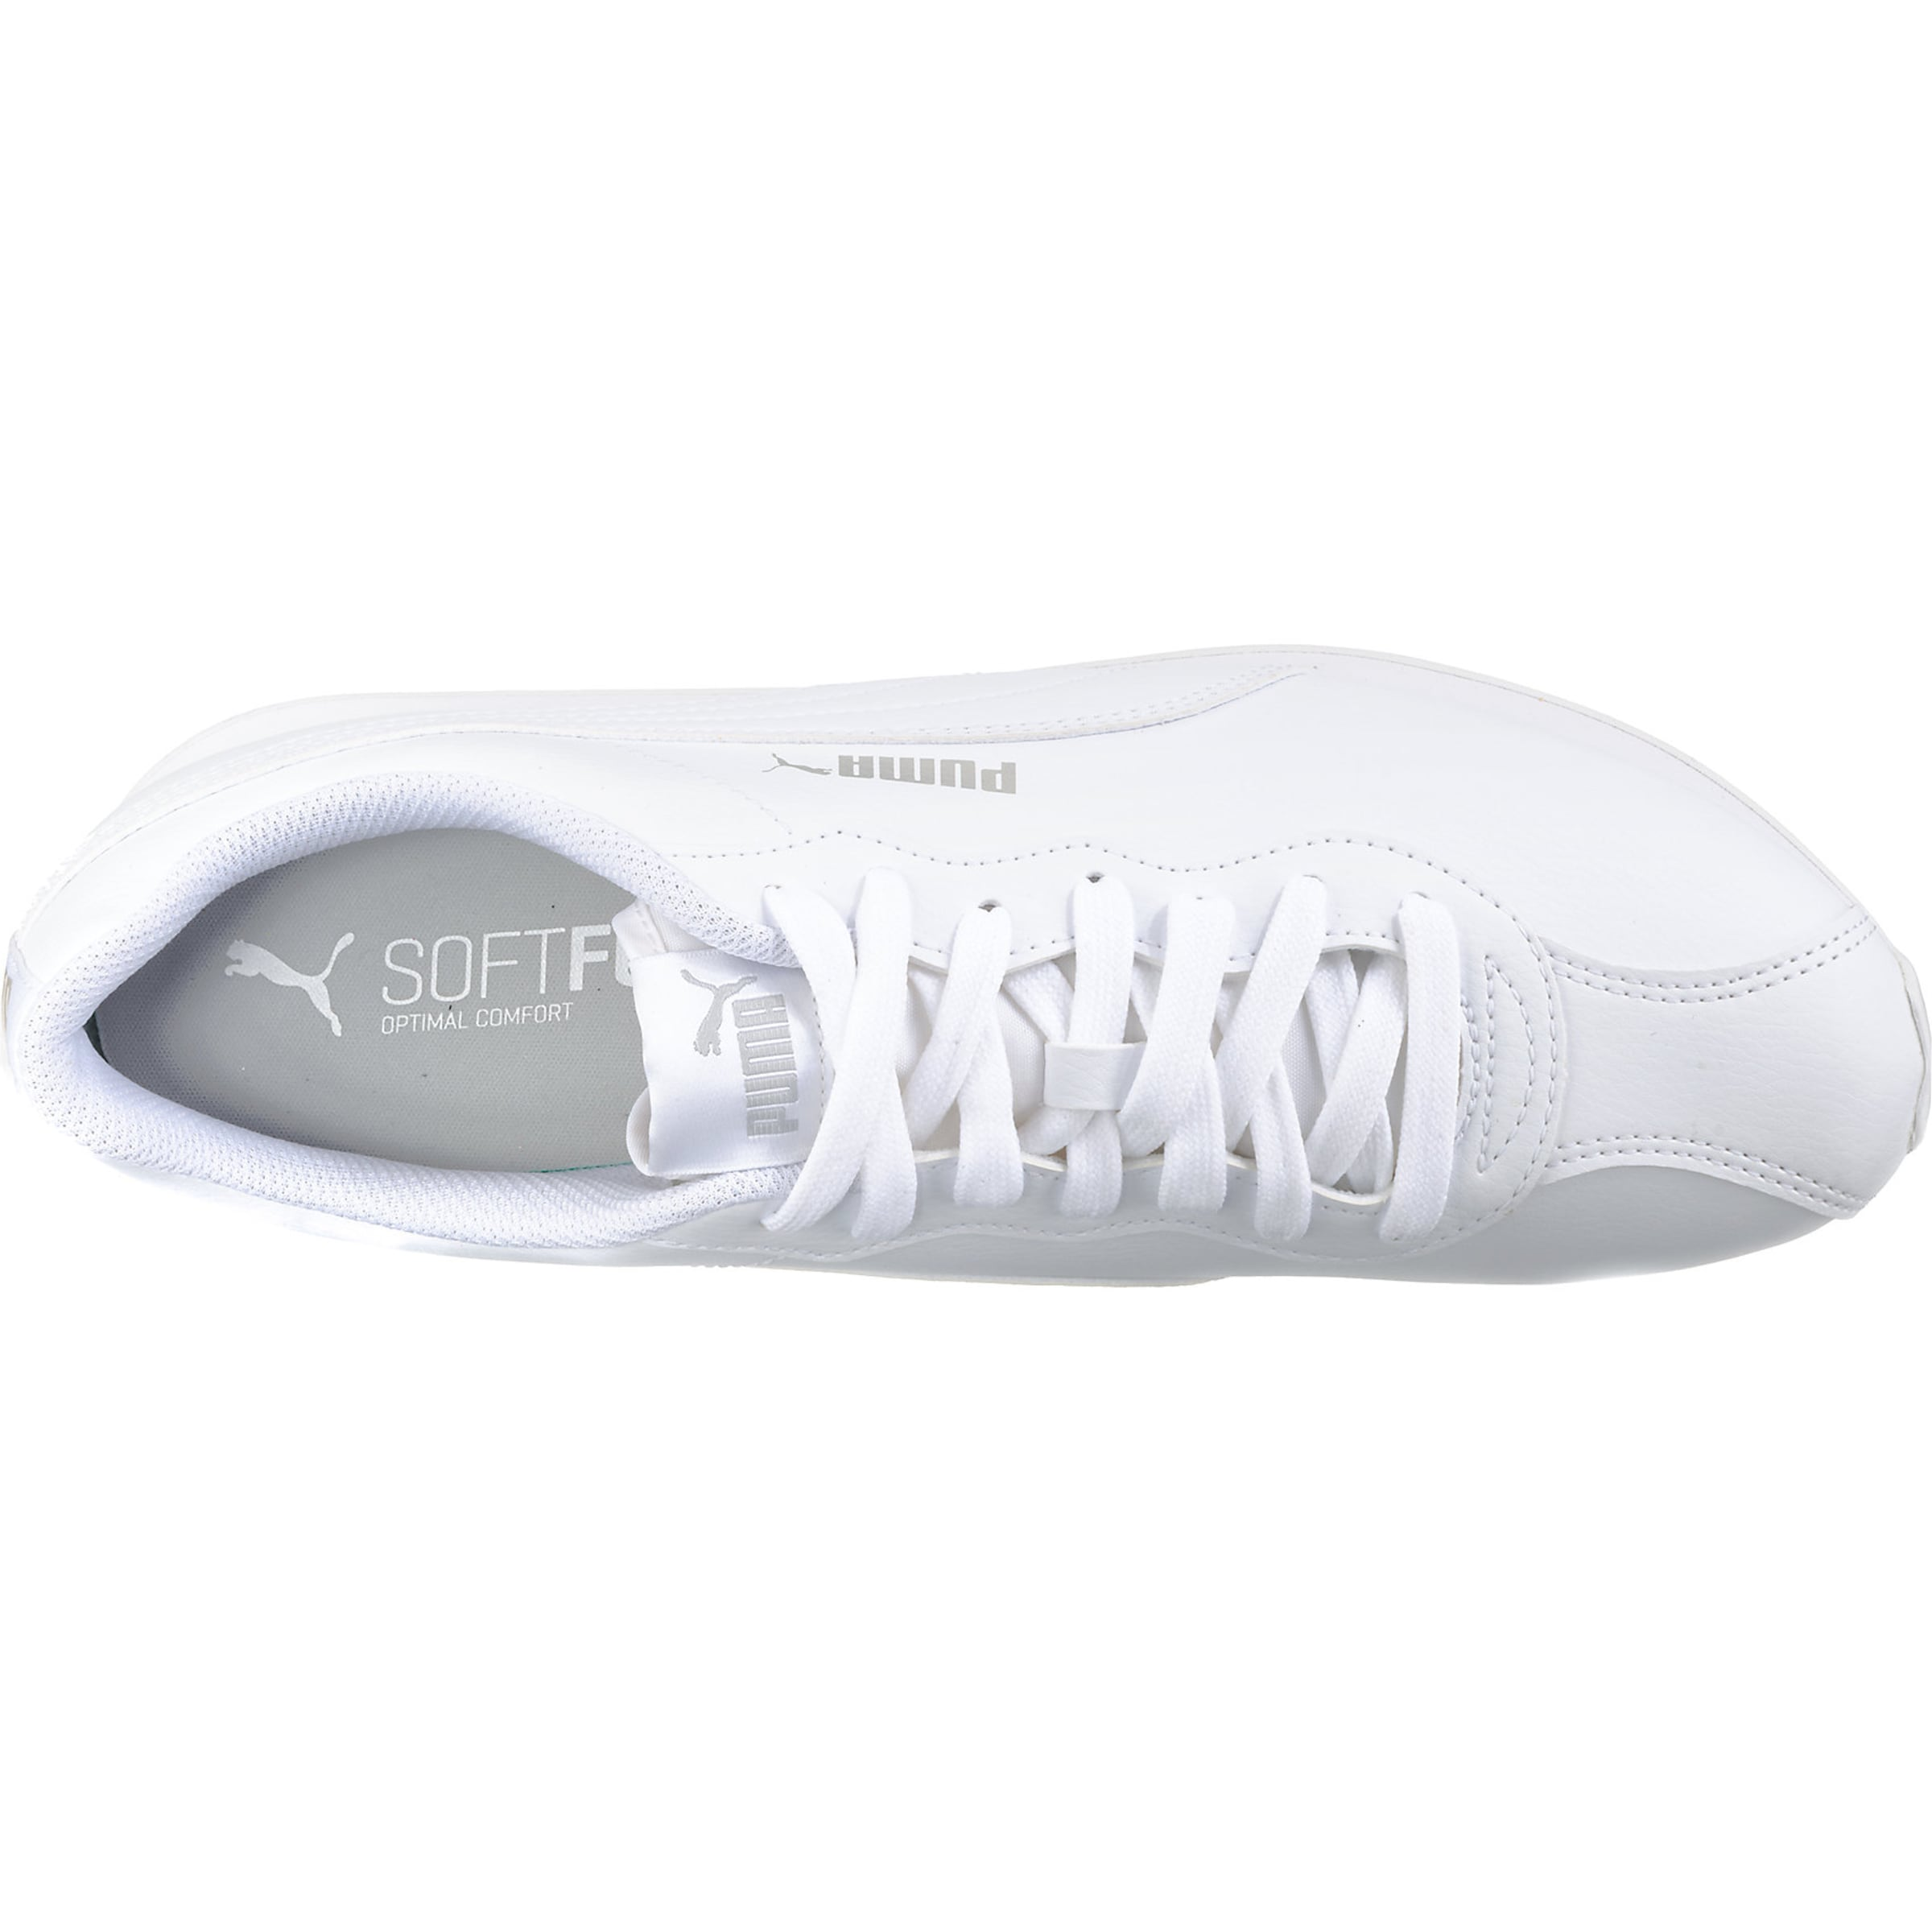 Puma Ii' In Sneakers Weiß 'turin kXlwZOPiuT